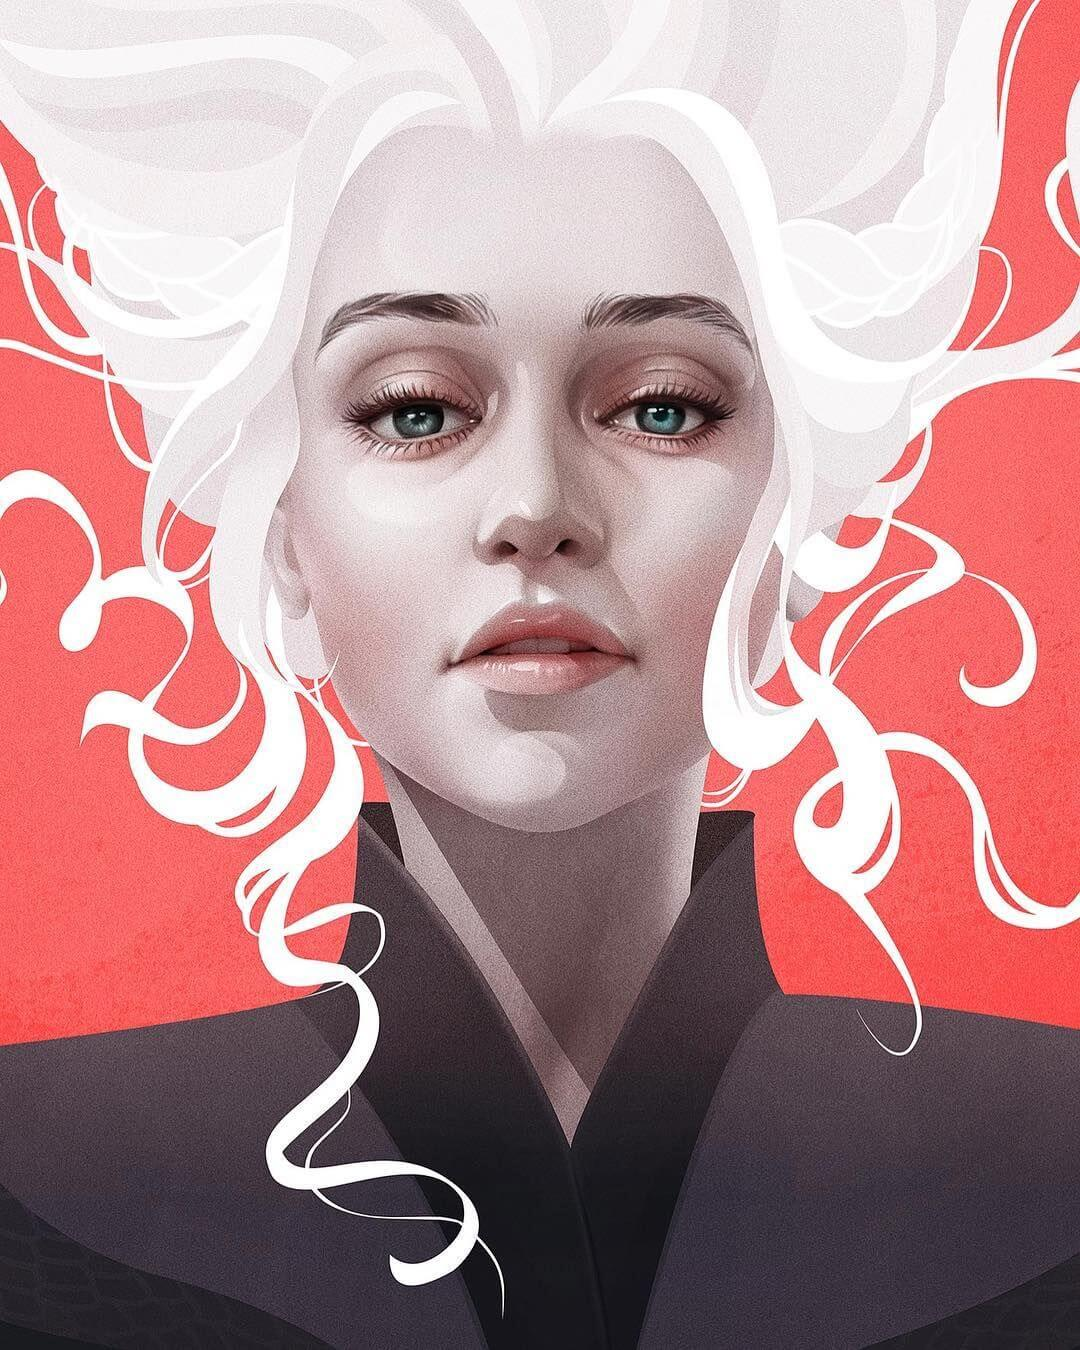 Daenerys Targaryen by YANA and JUN